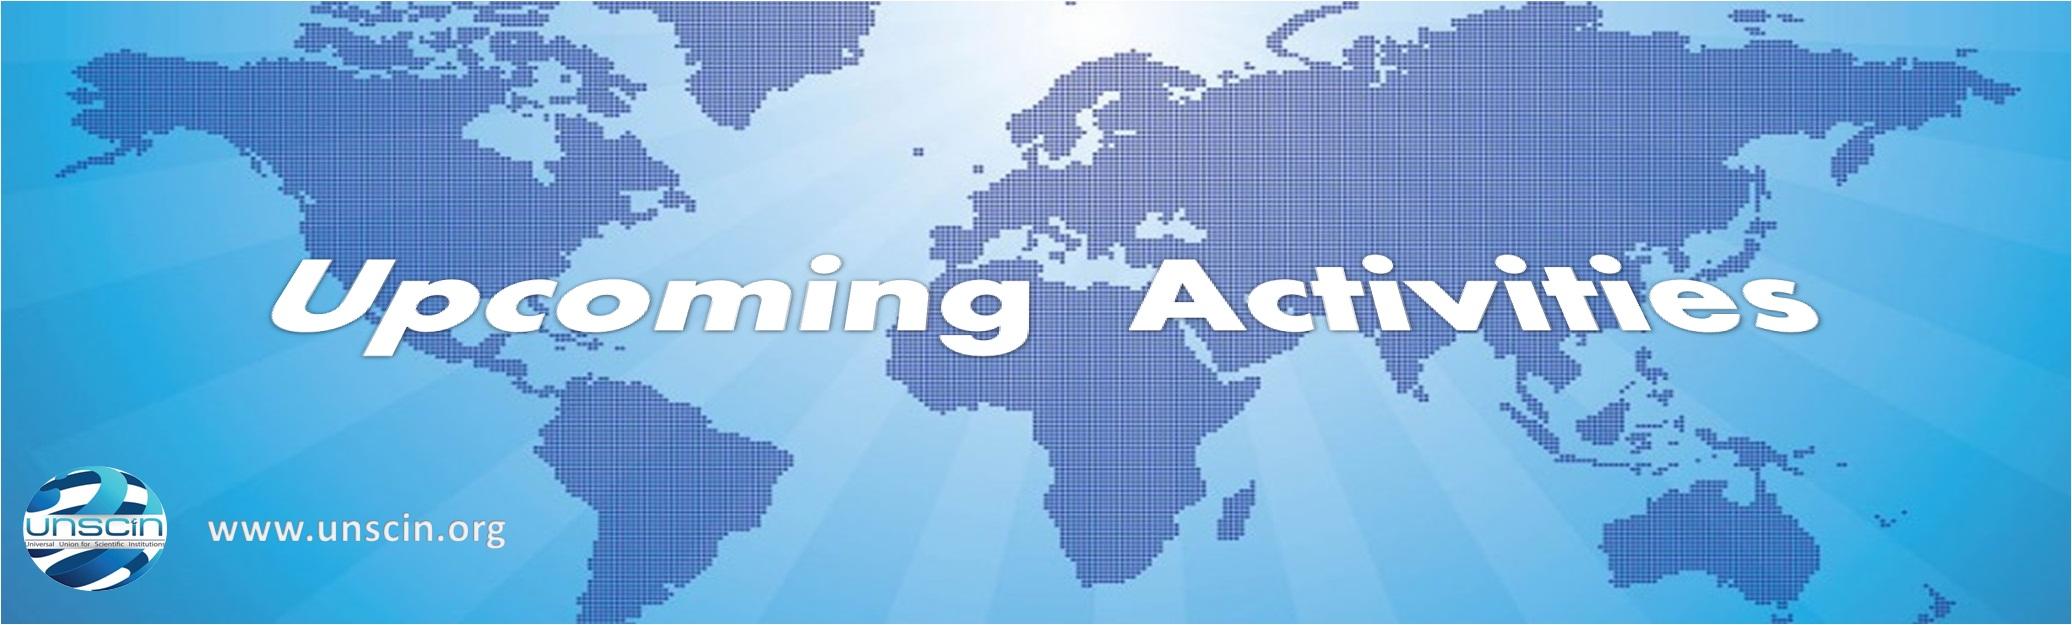 UNSCIN UPCOMING ACTIVITIES